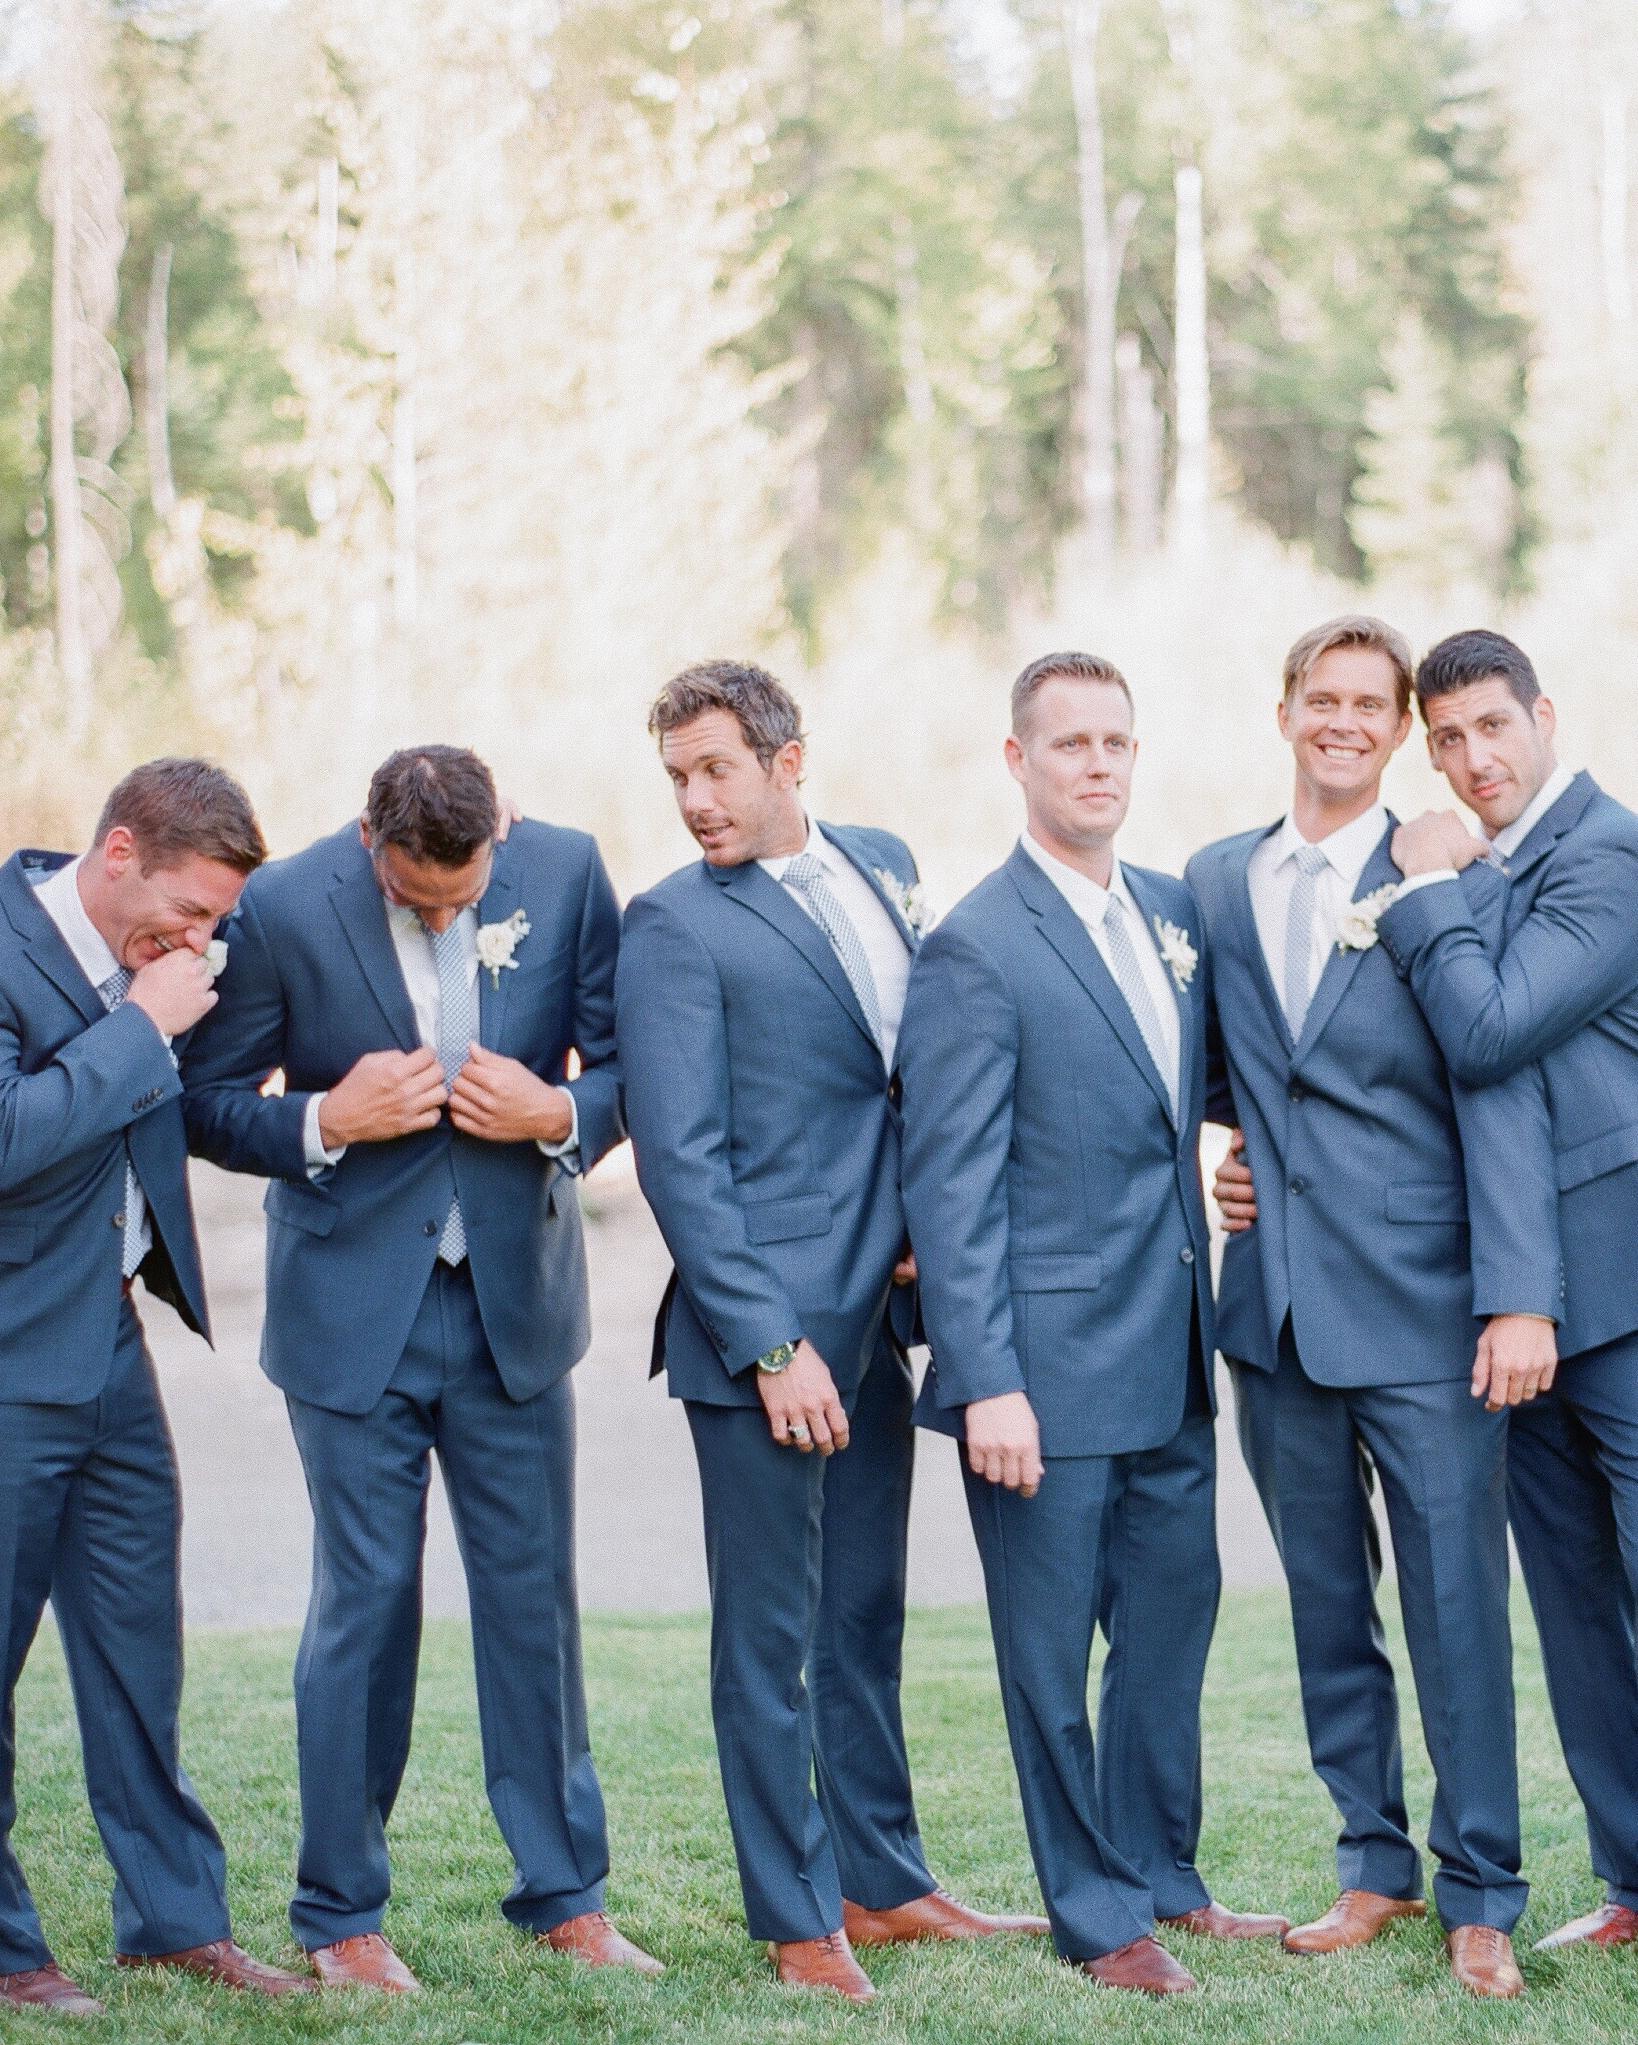 robin-kenny-wedding-groomsmen-061-s112068-0715.jpg